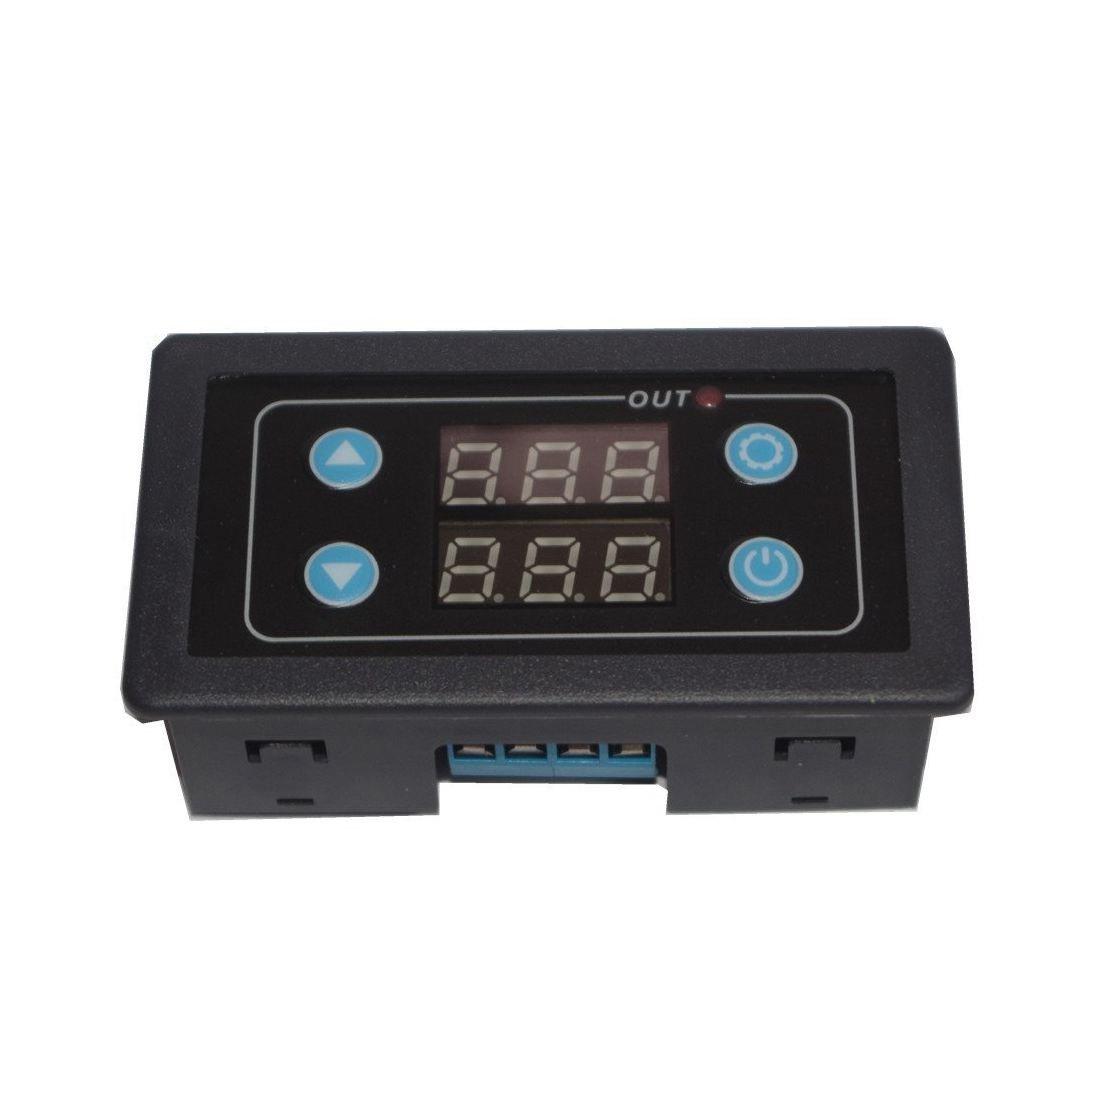 SODIAL Programable DC24V Interruptor de temporizador de rele de retardo de ciclo digital de 1 canal Pantalla LED 0-999 horas